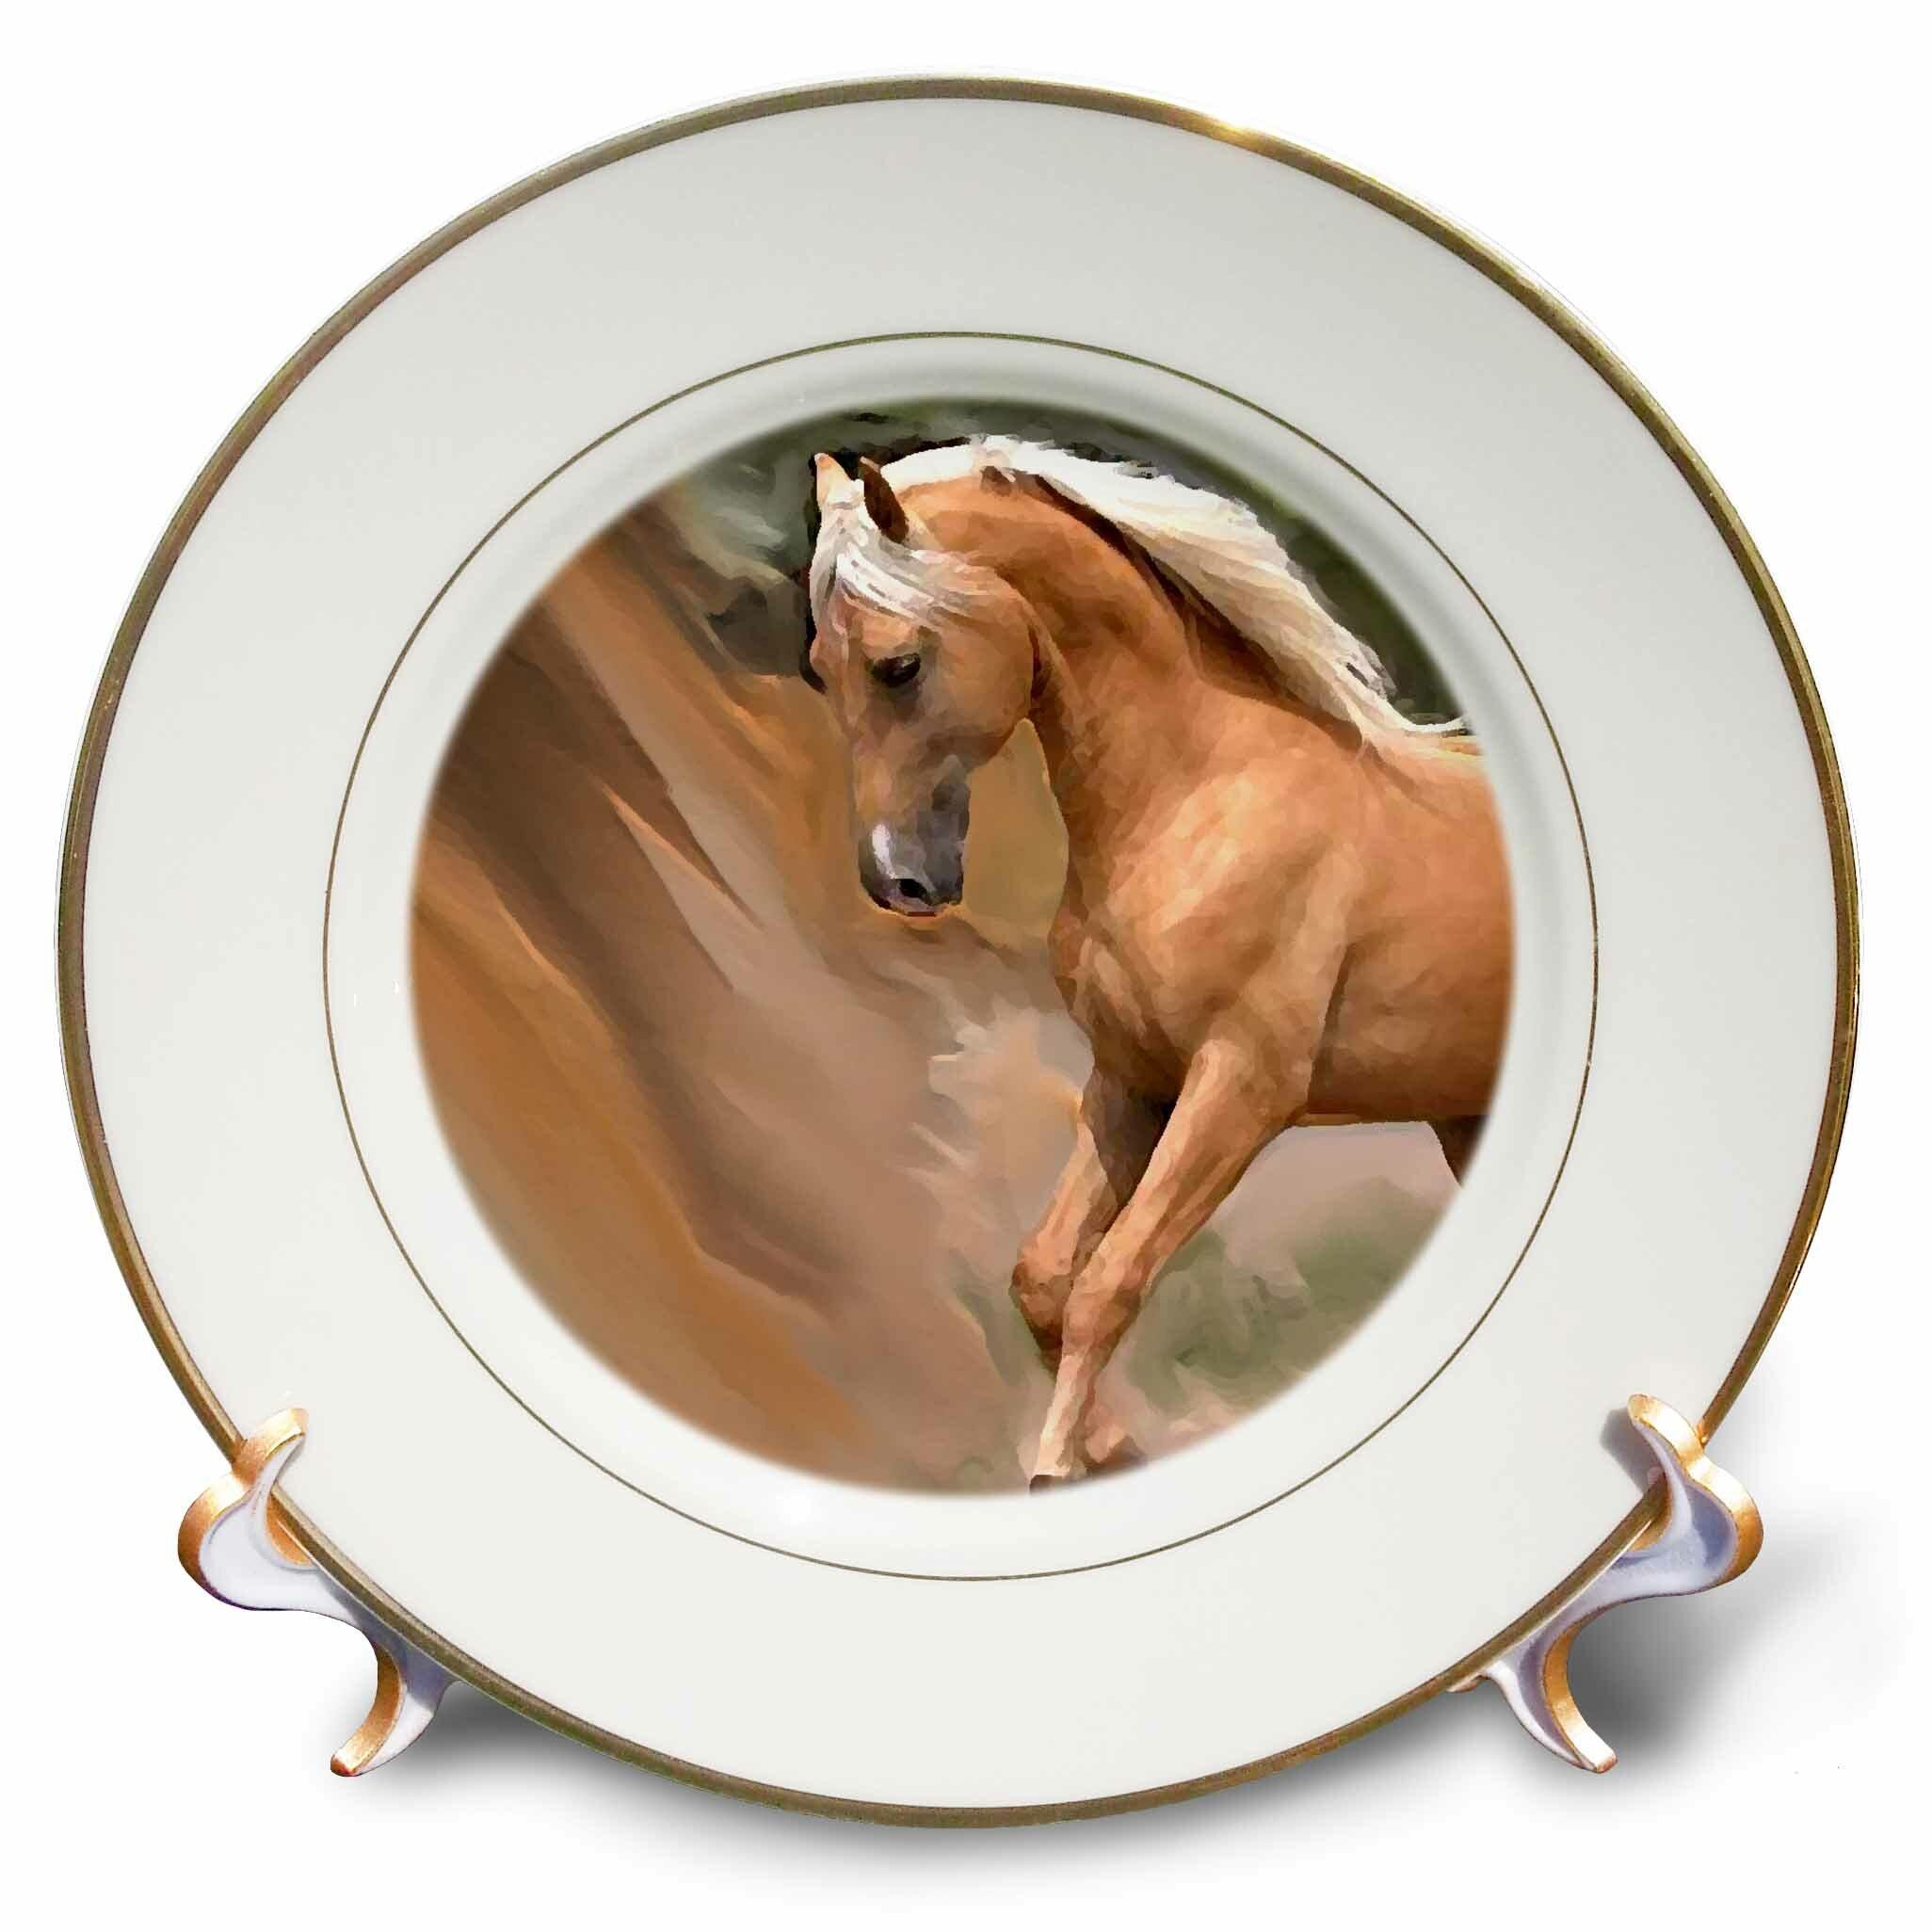 East Urban Home Palomino Horse Porcelain Decorative Plate Wayfair